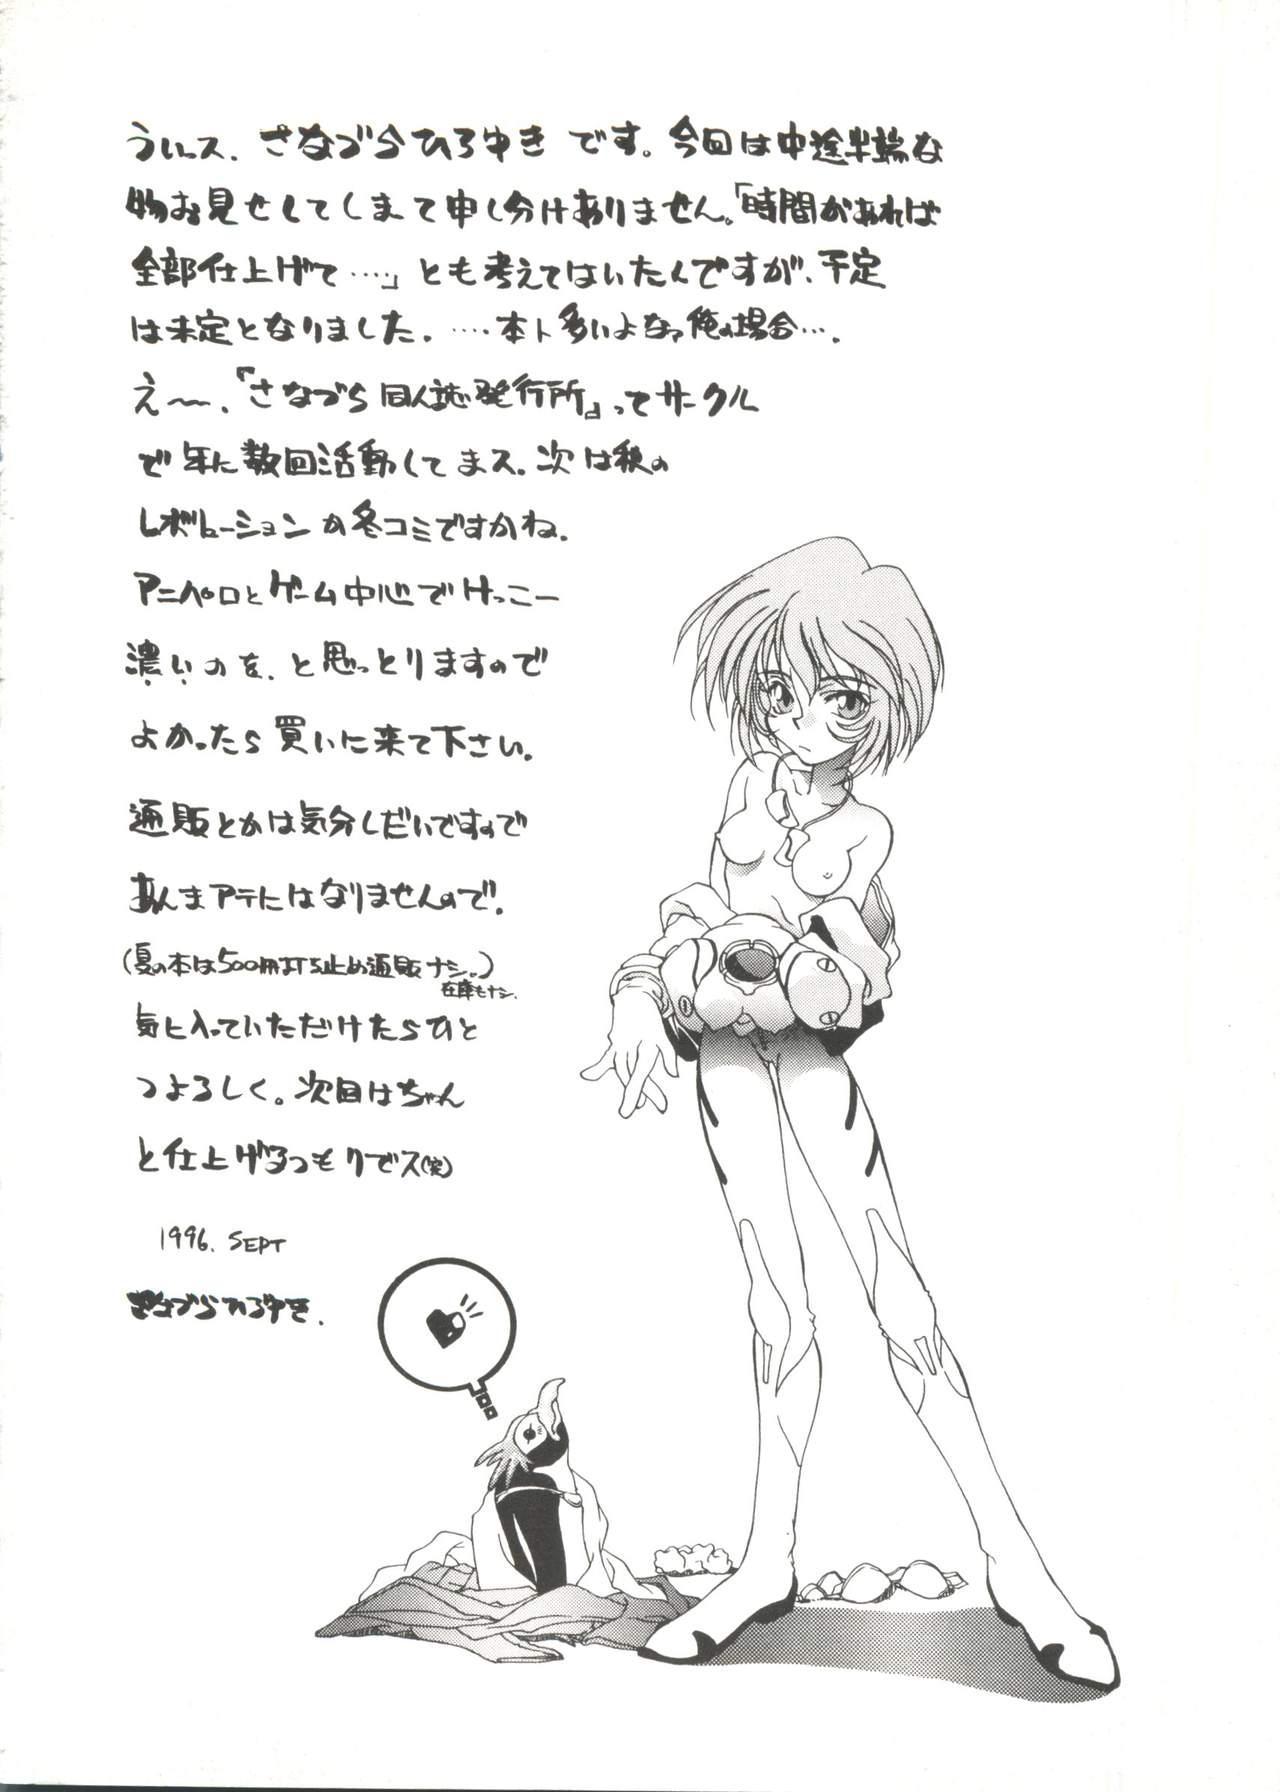 Bishoujo Doujin Peach Club - Pretty Gal's Fanzine Peach Club 9 15